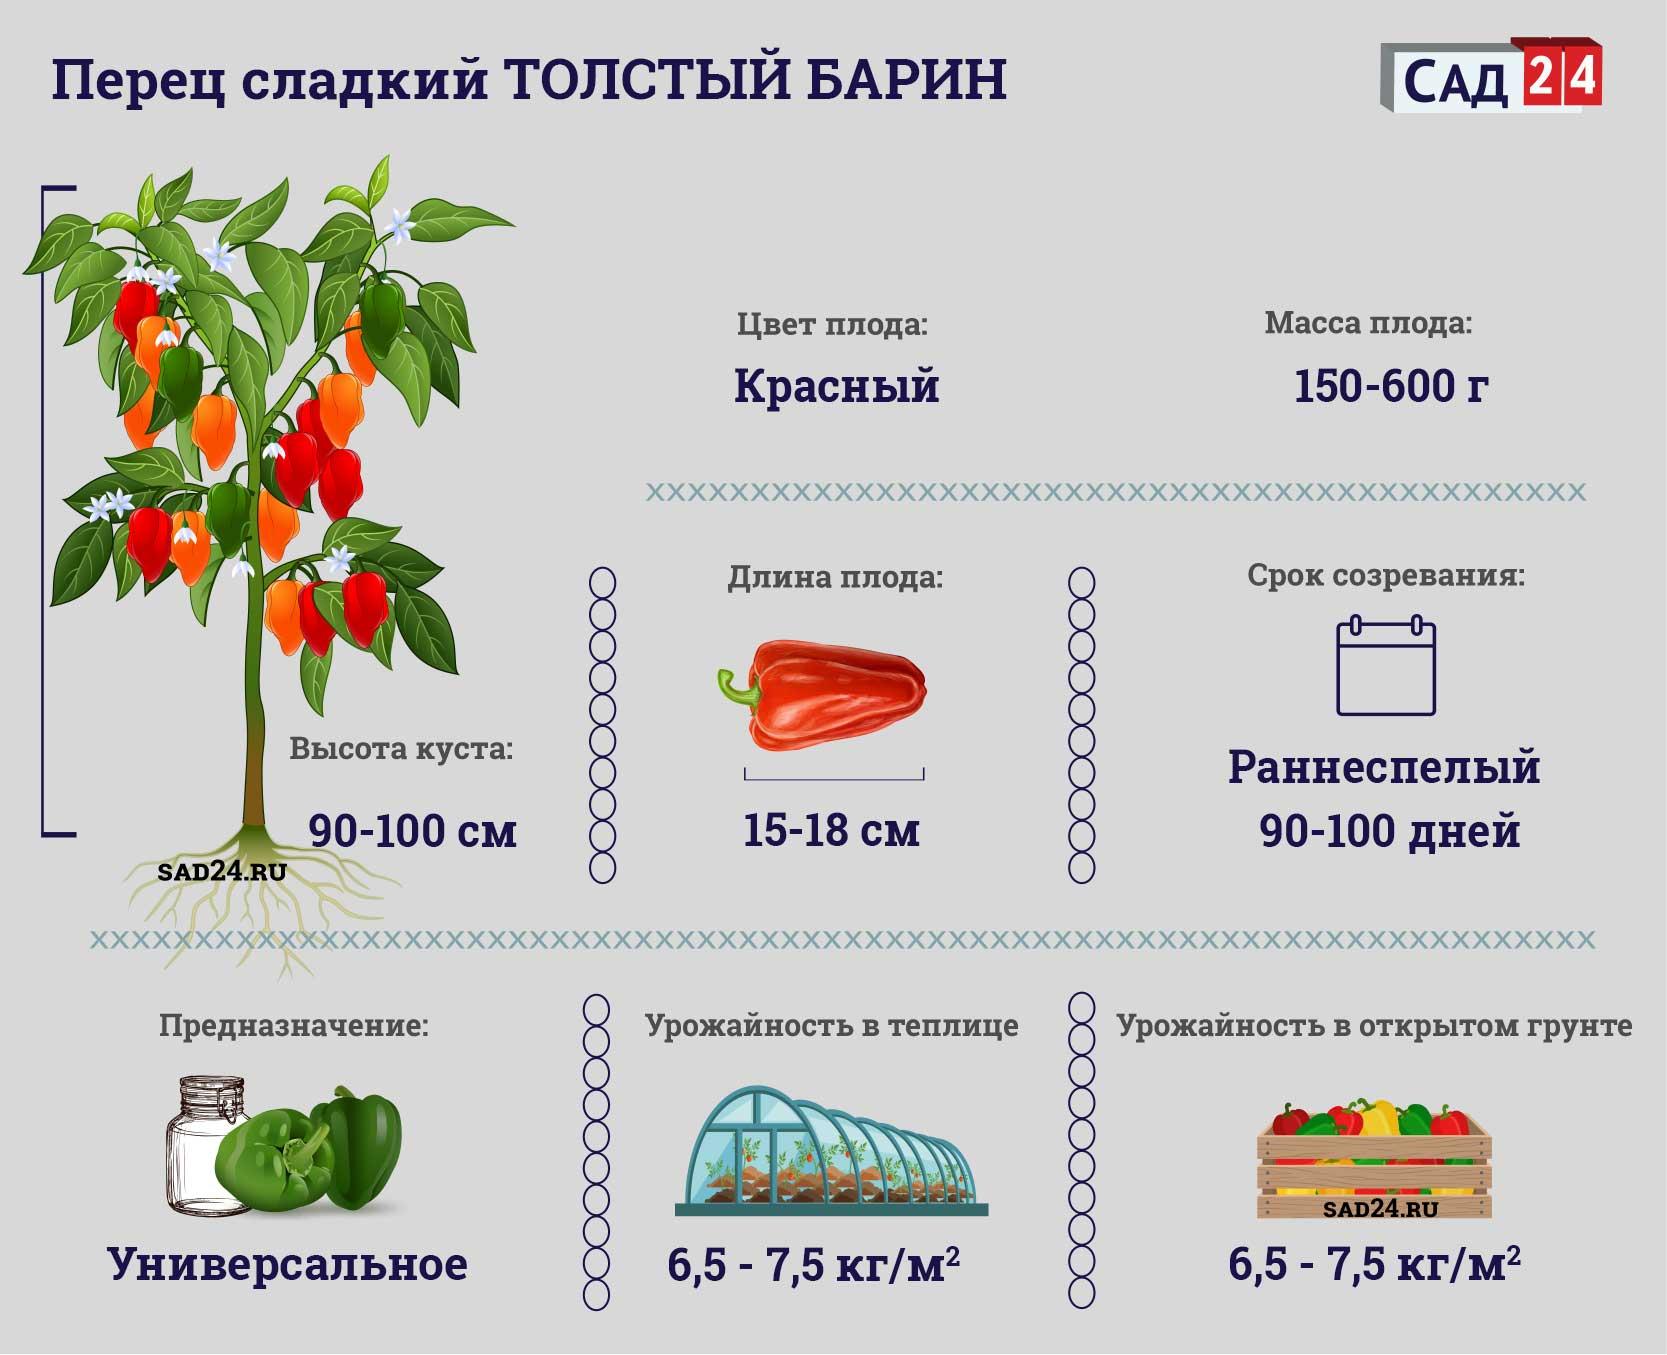 Толстый барин https://sad24.ru